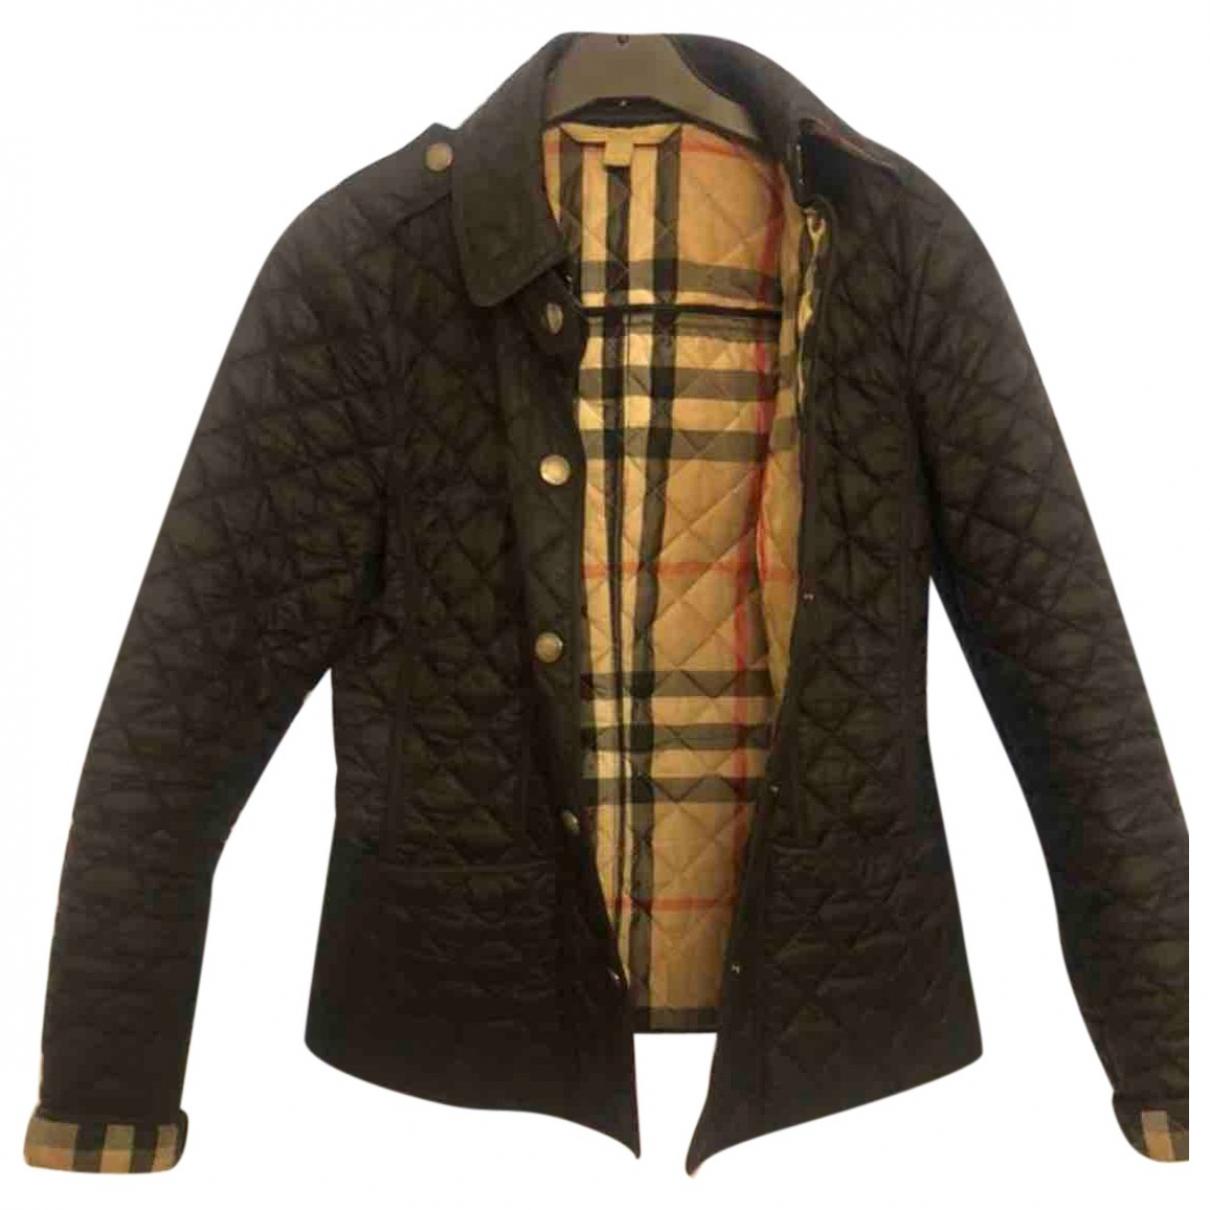 Burberry \N Black jacket for Women S International